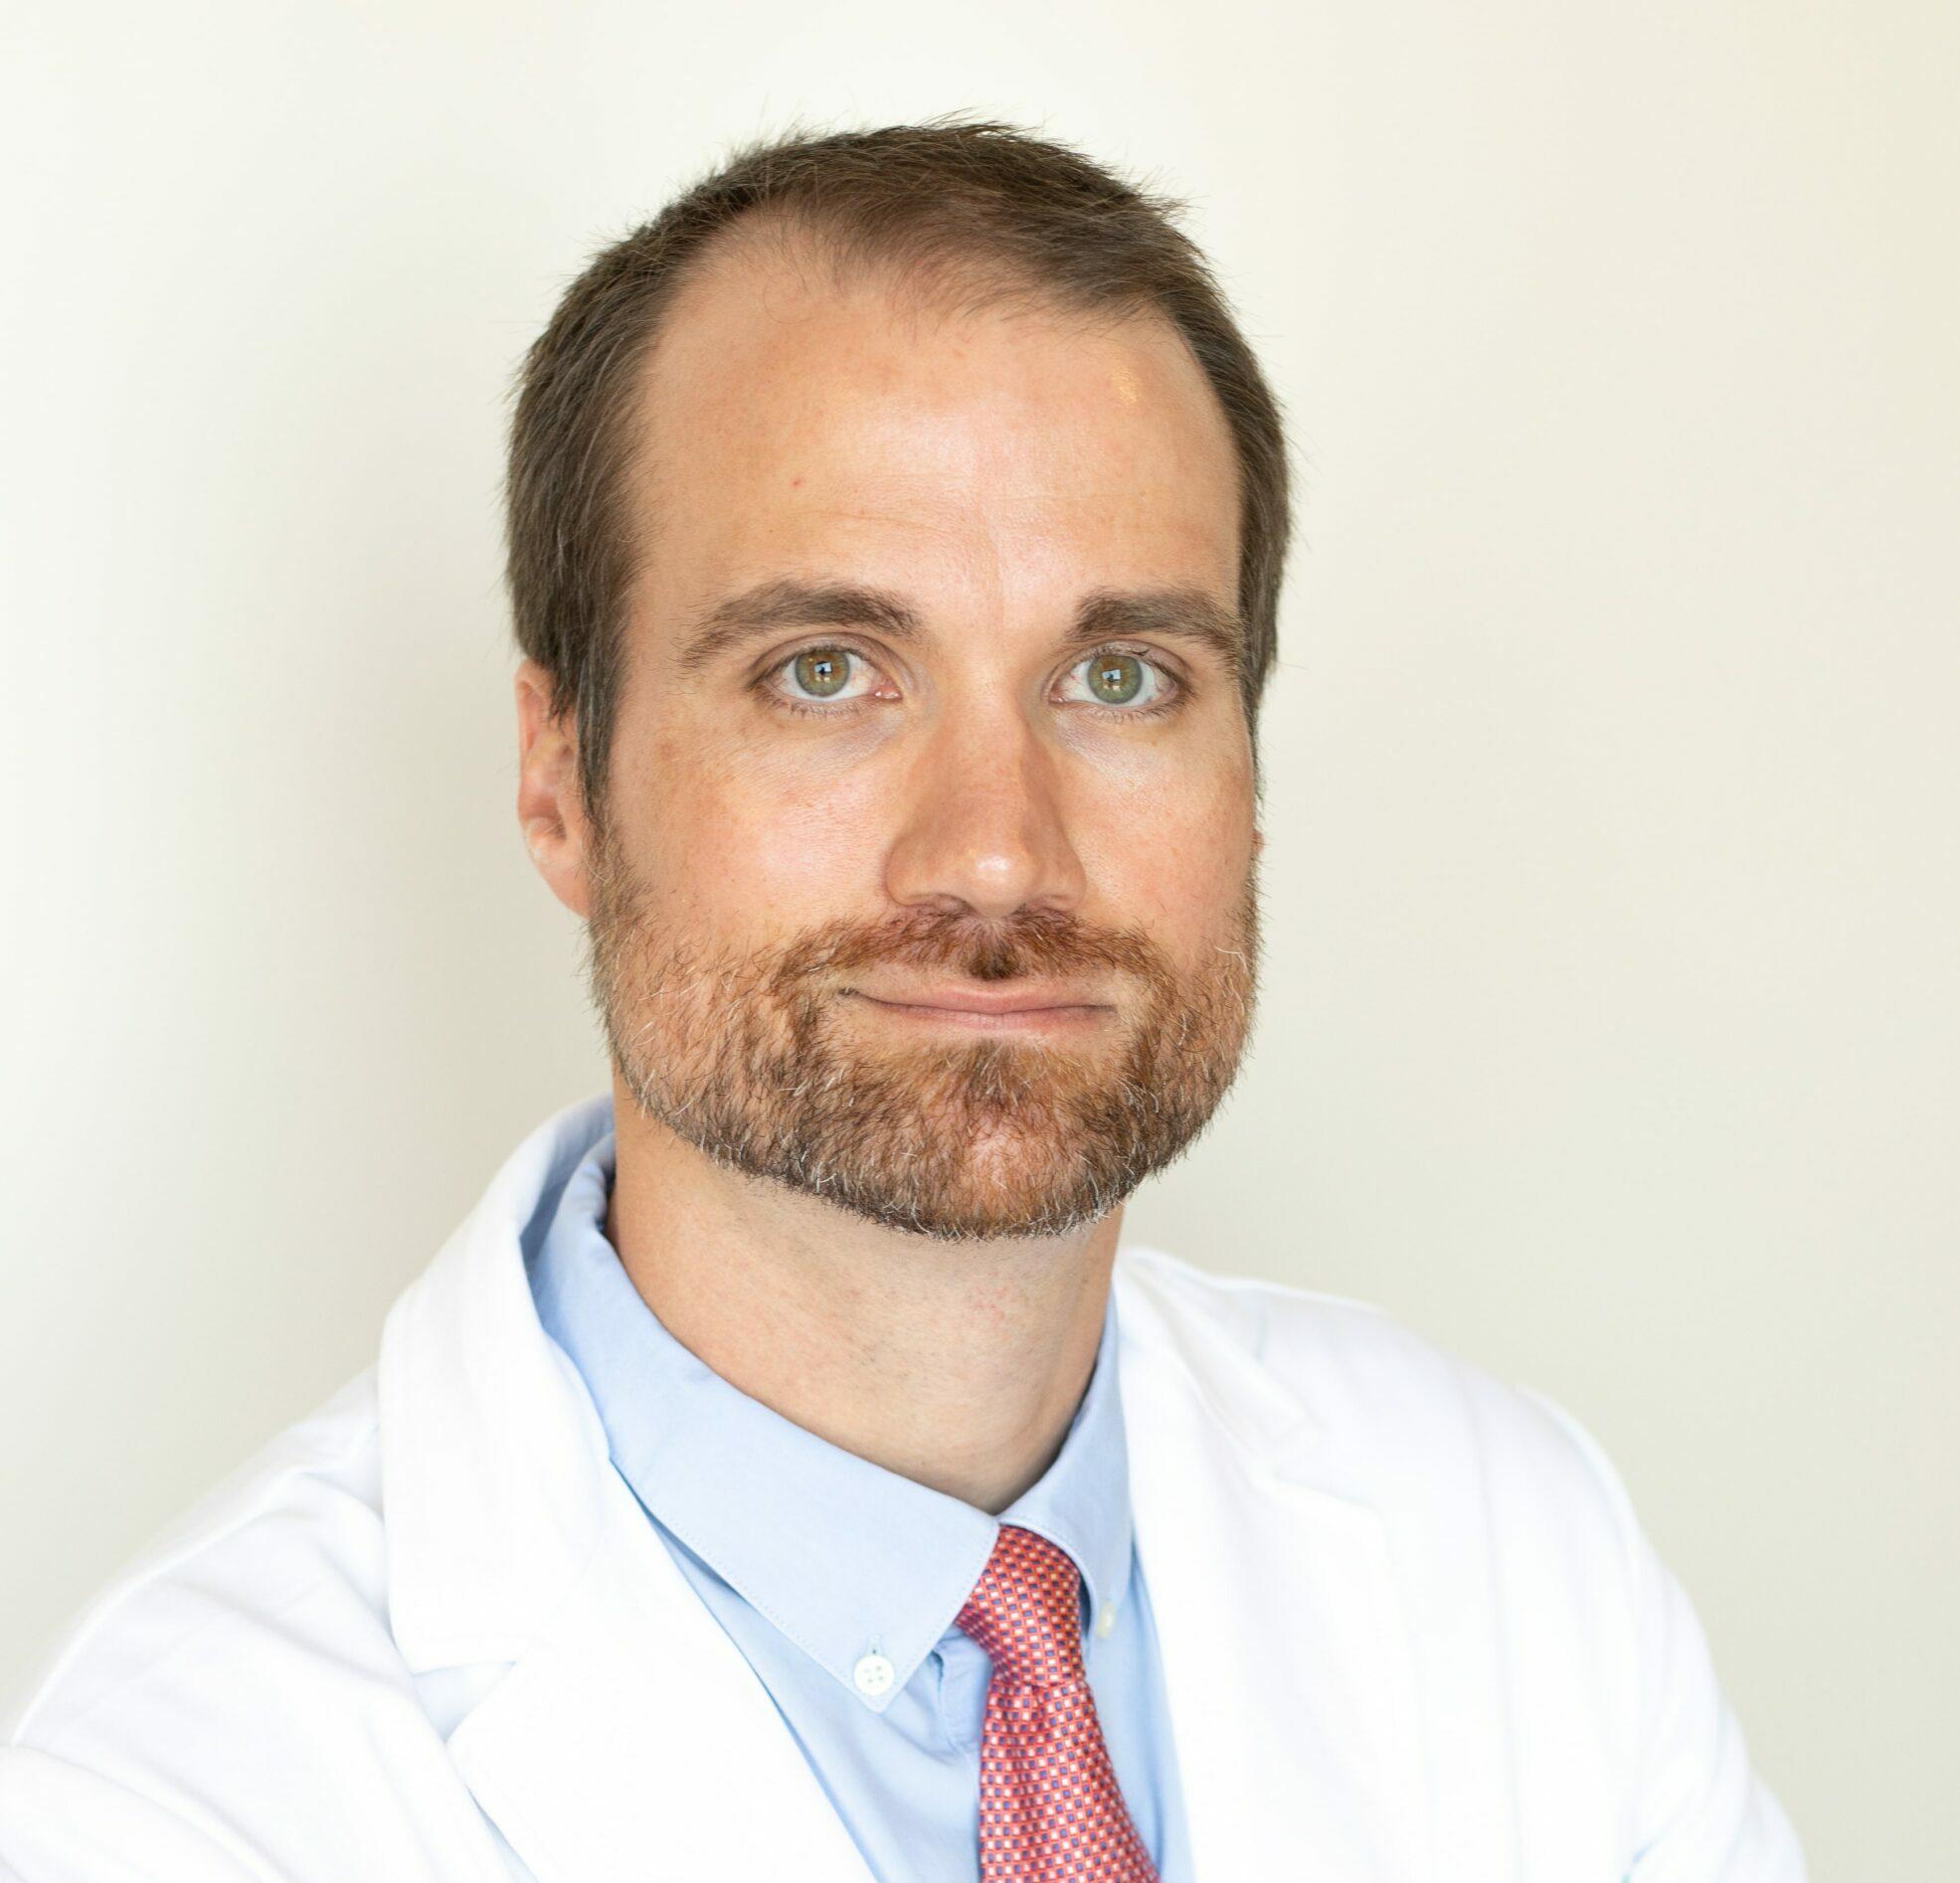 Marcus K. Weldon, MD